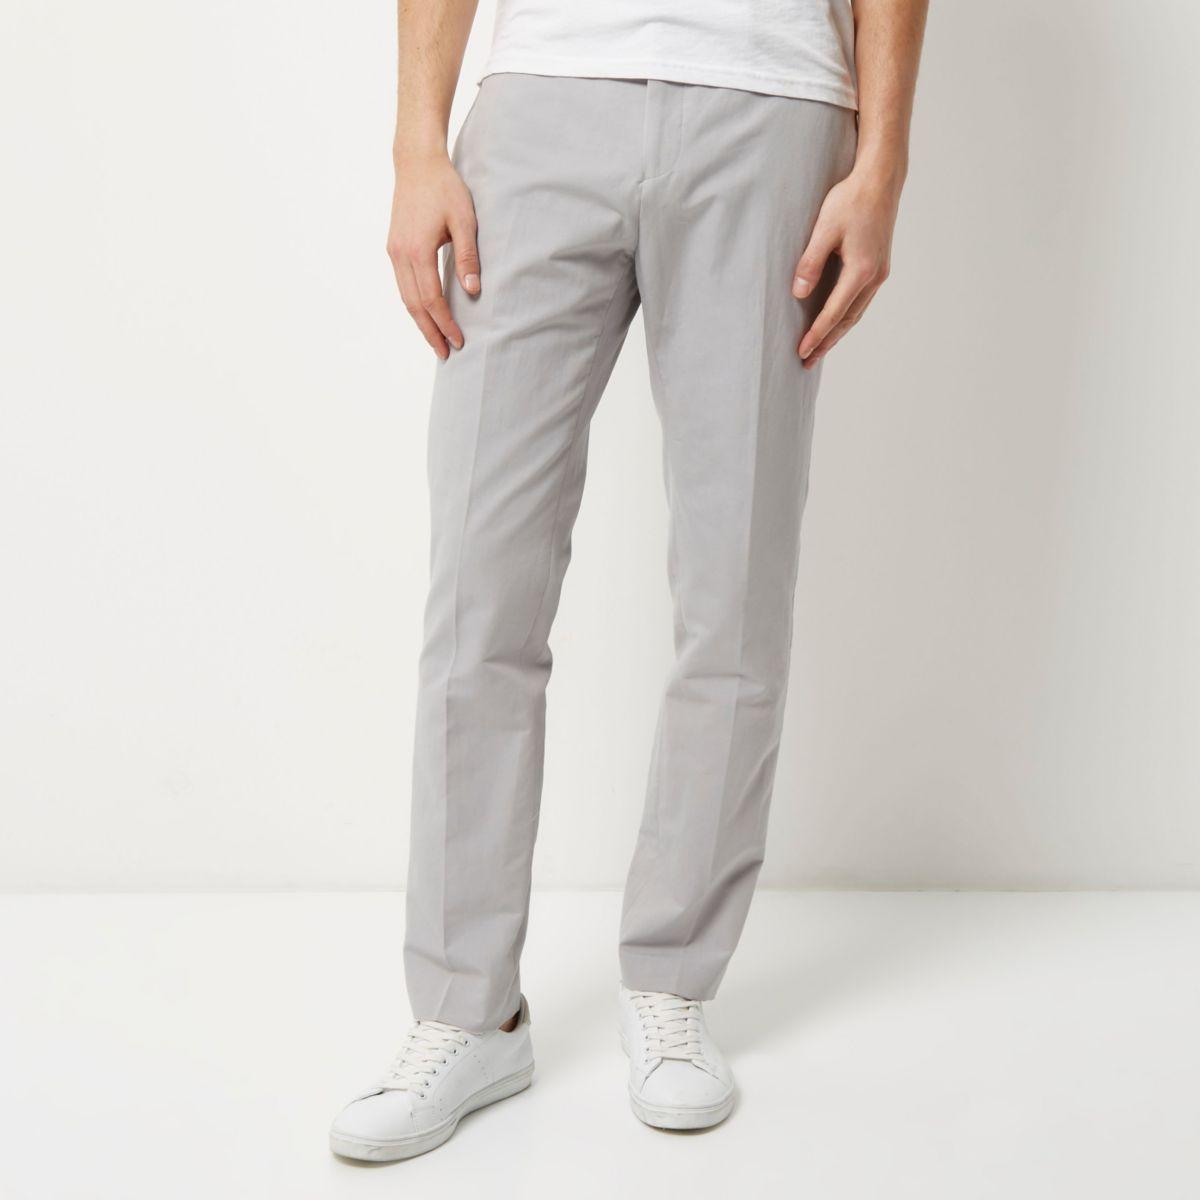 Grey smart slim elastic waist trousers